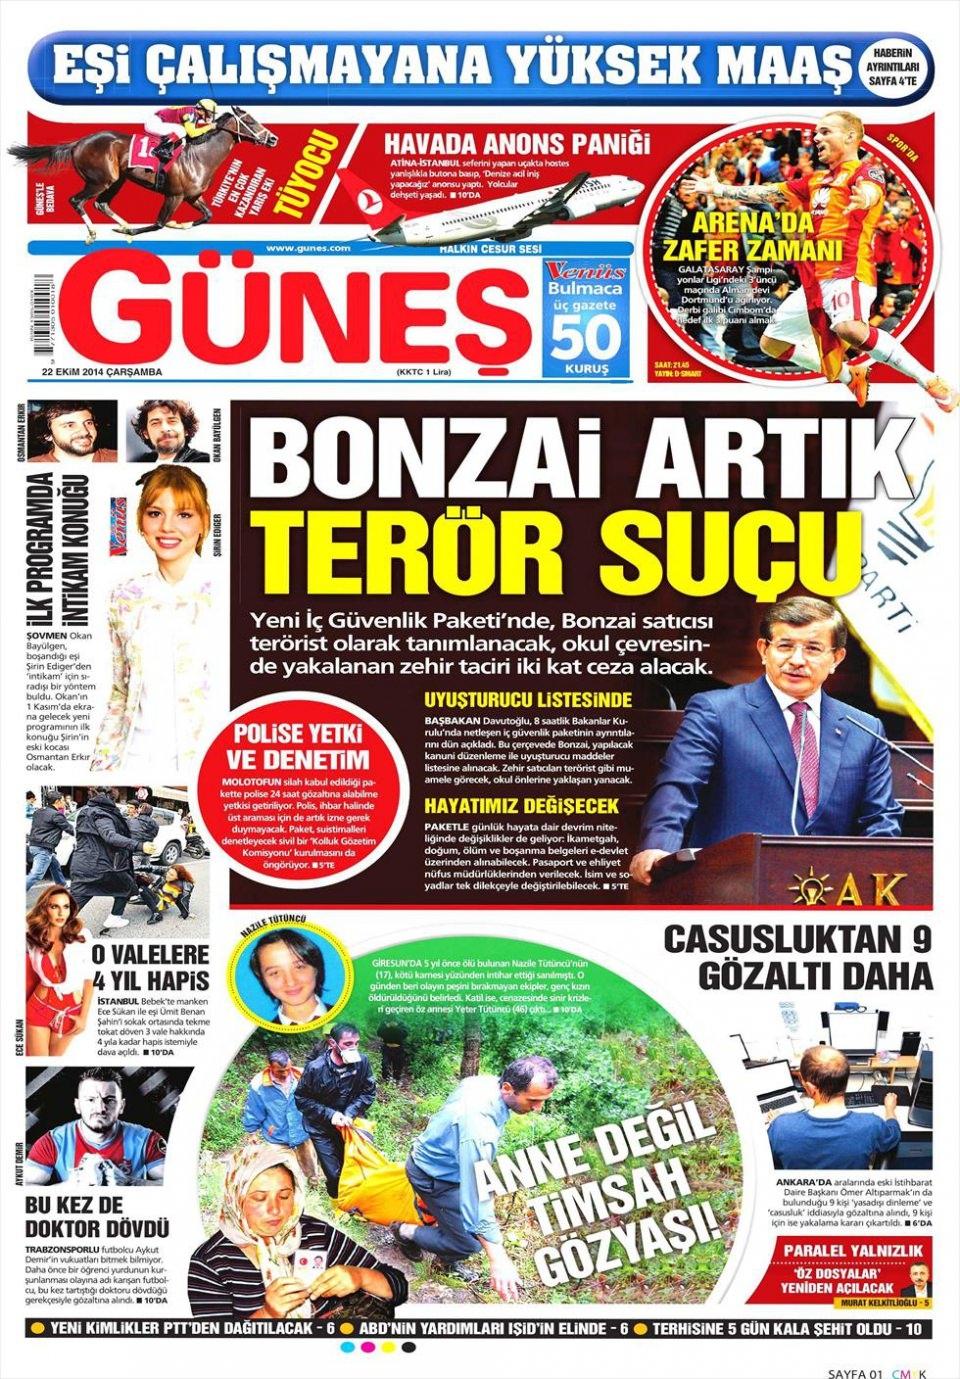 22 Ekim 2014 gazete manşetleri 8